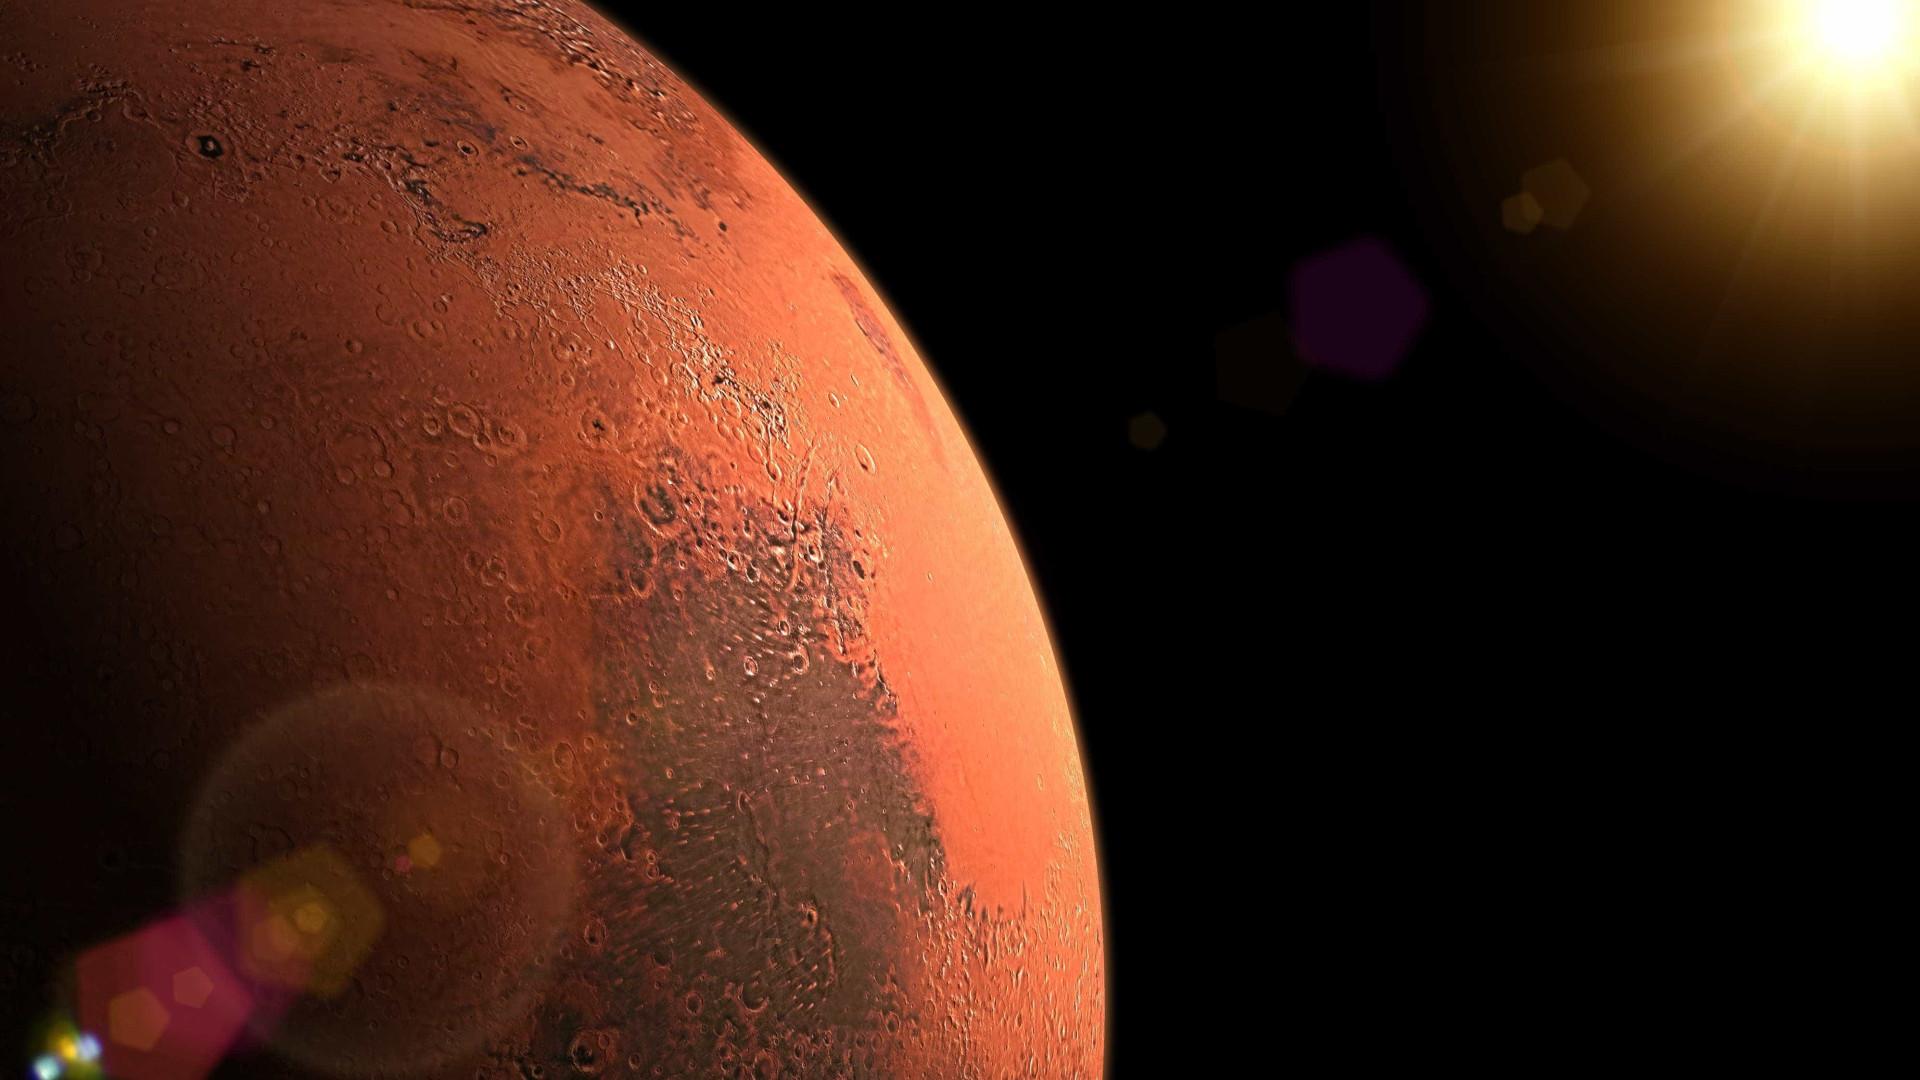 Quer saber como chegar a Marte? Elon Musk explica